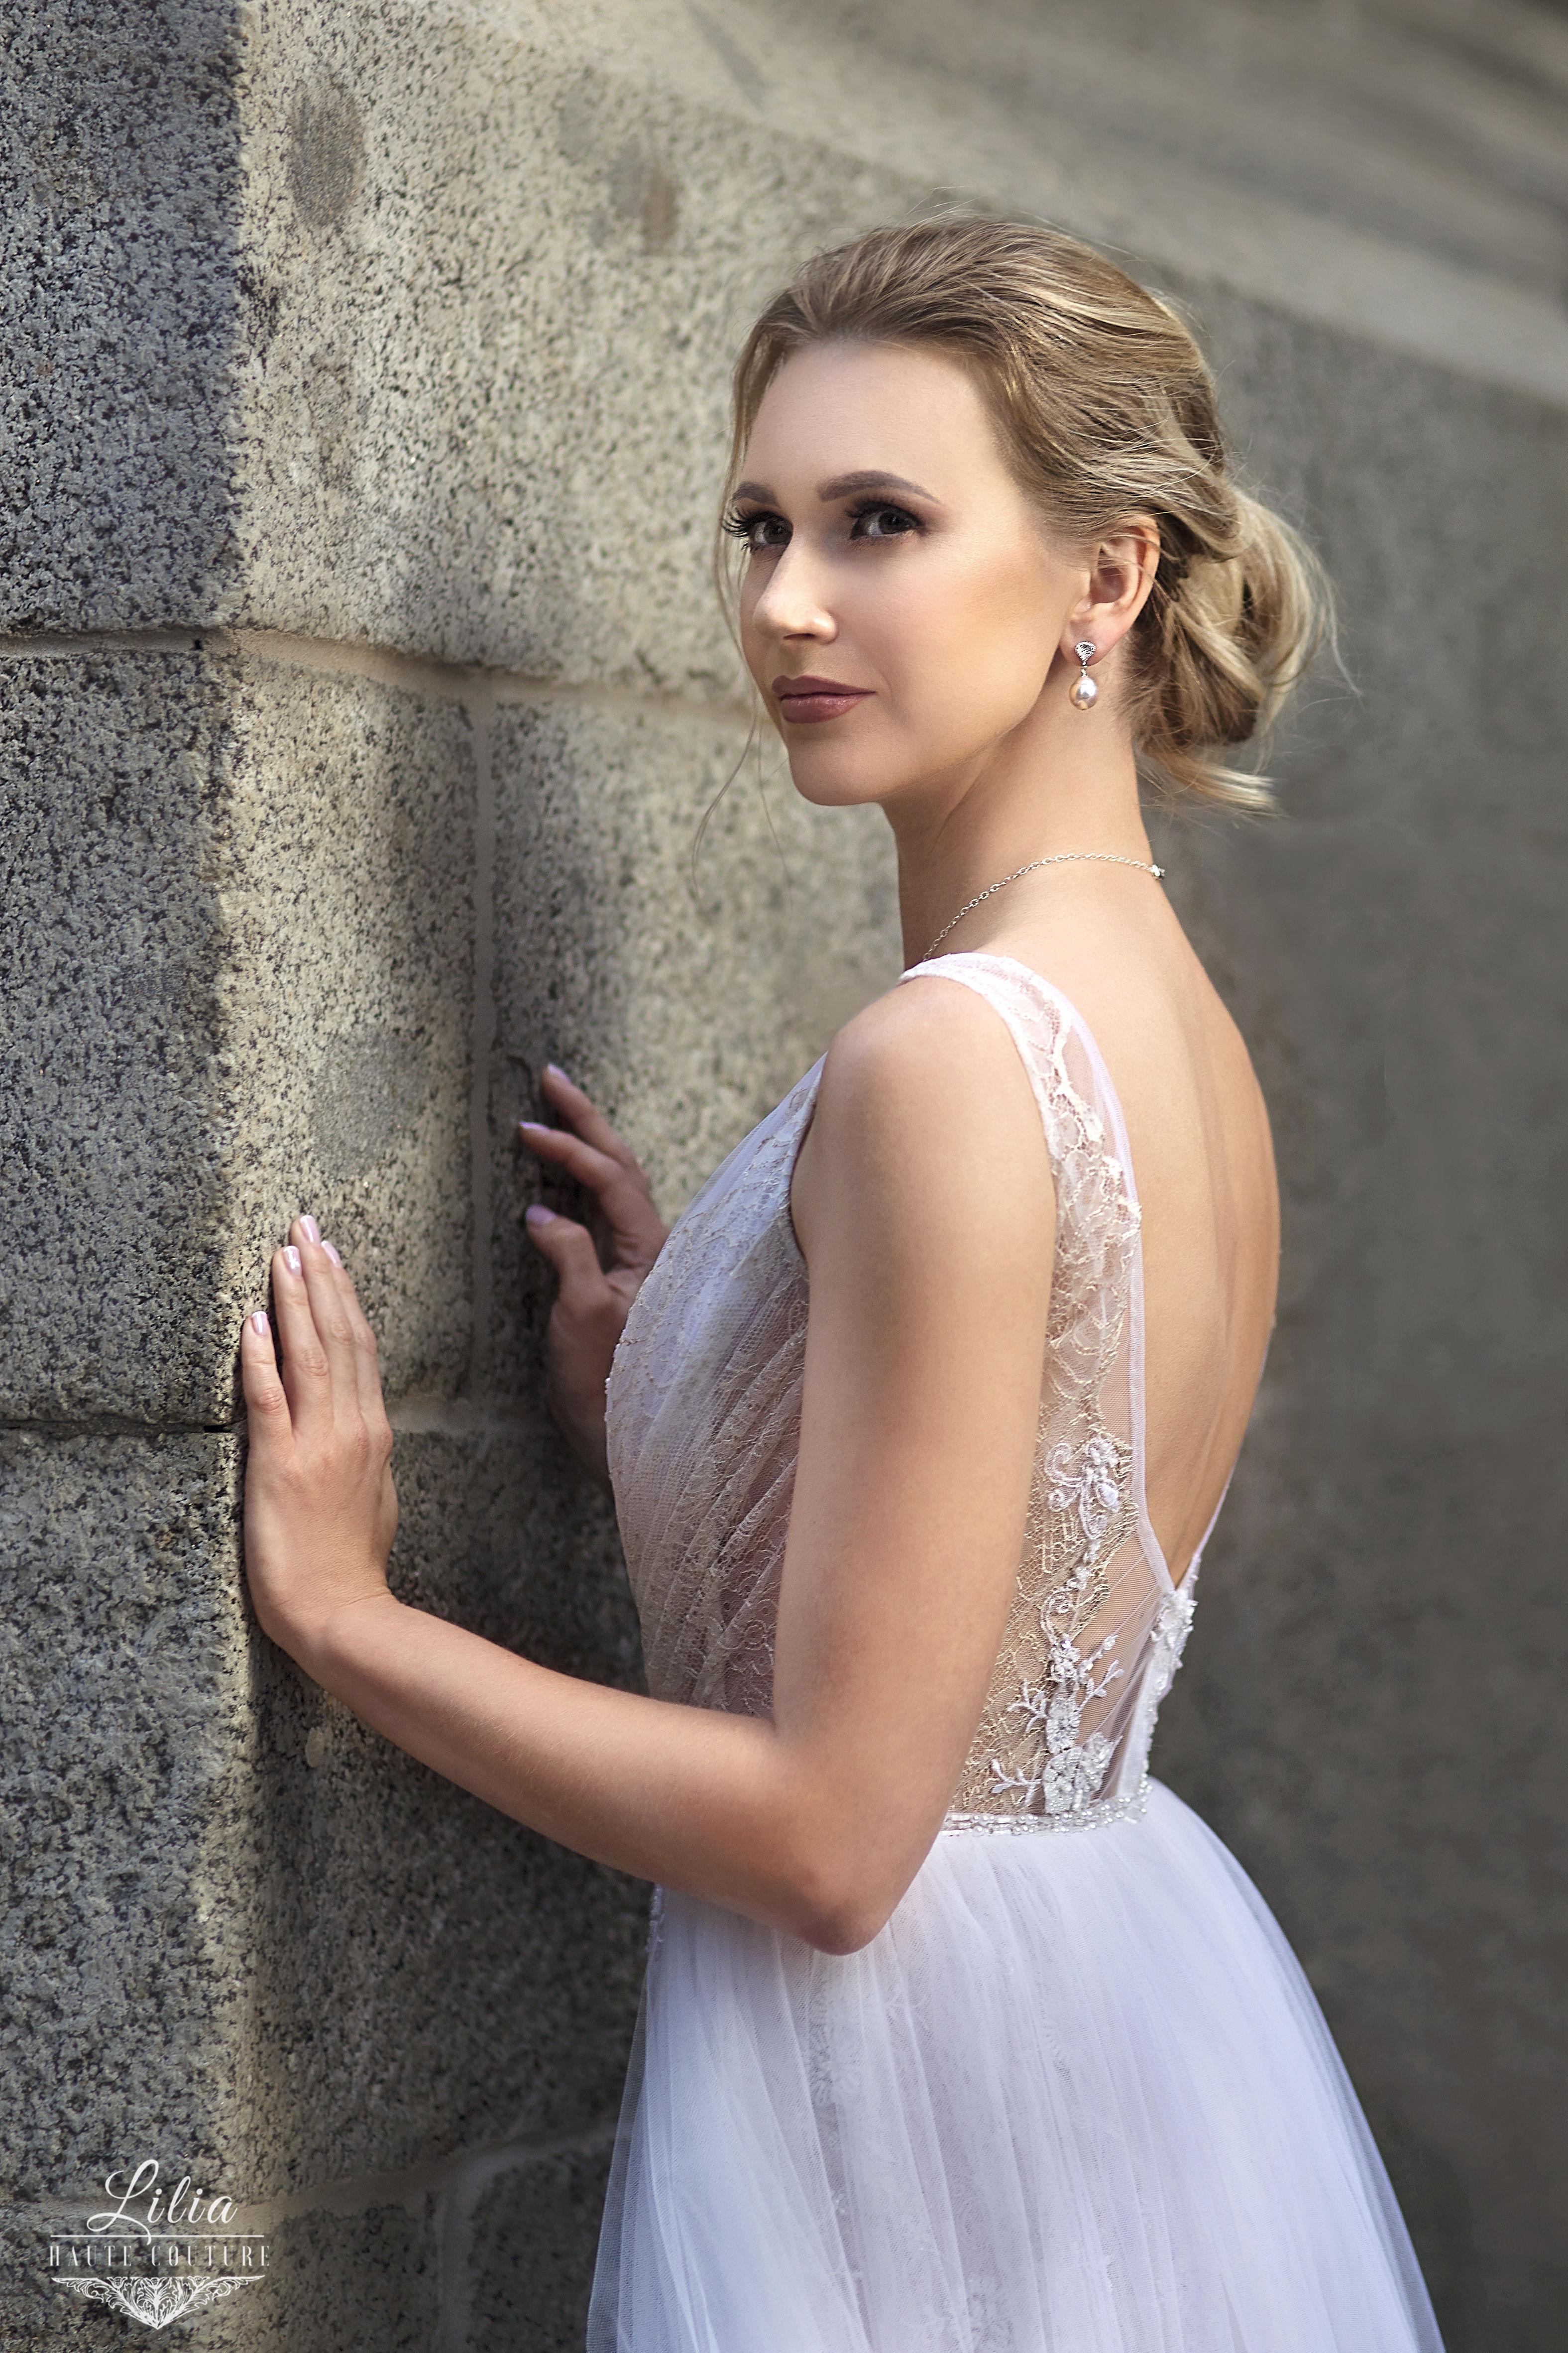 robes de mariee haute gamme montreal designer boutique robe de soiree lilia haute couture